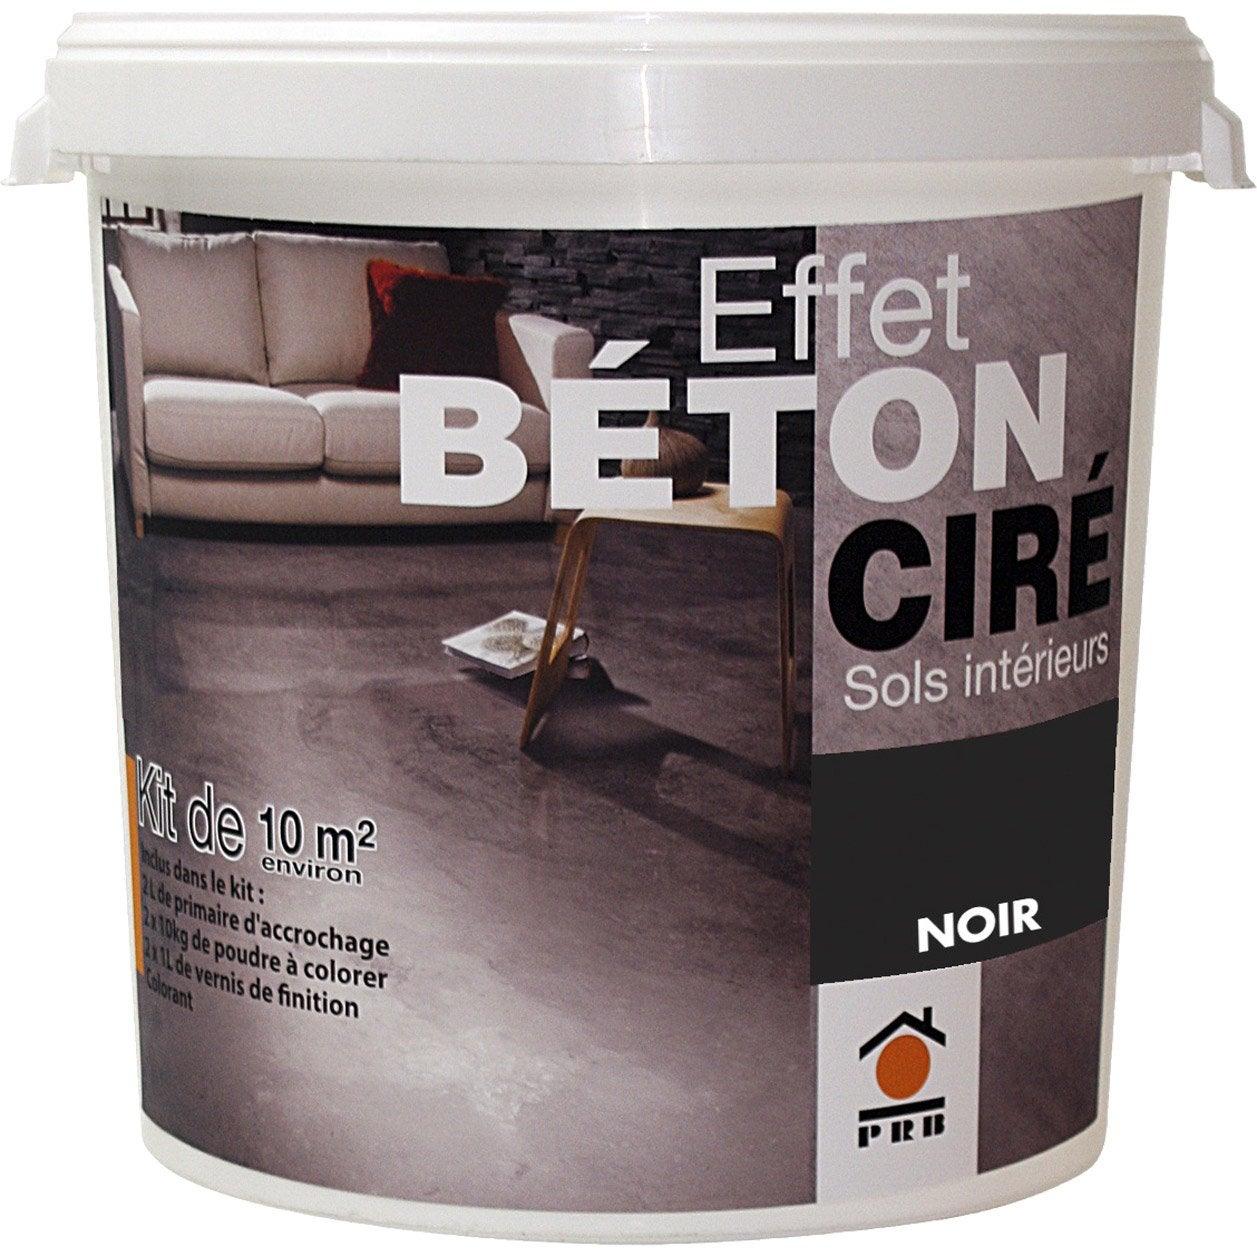 Bton Effet Cir Gris Smoke Prb M With Beton Cire Pour Escalier Exterieur